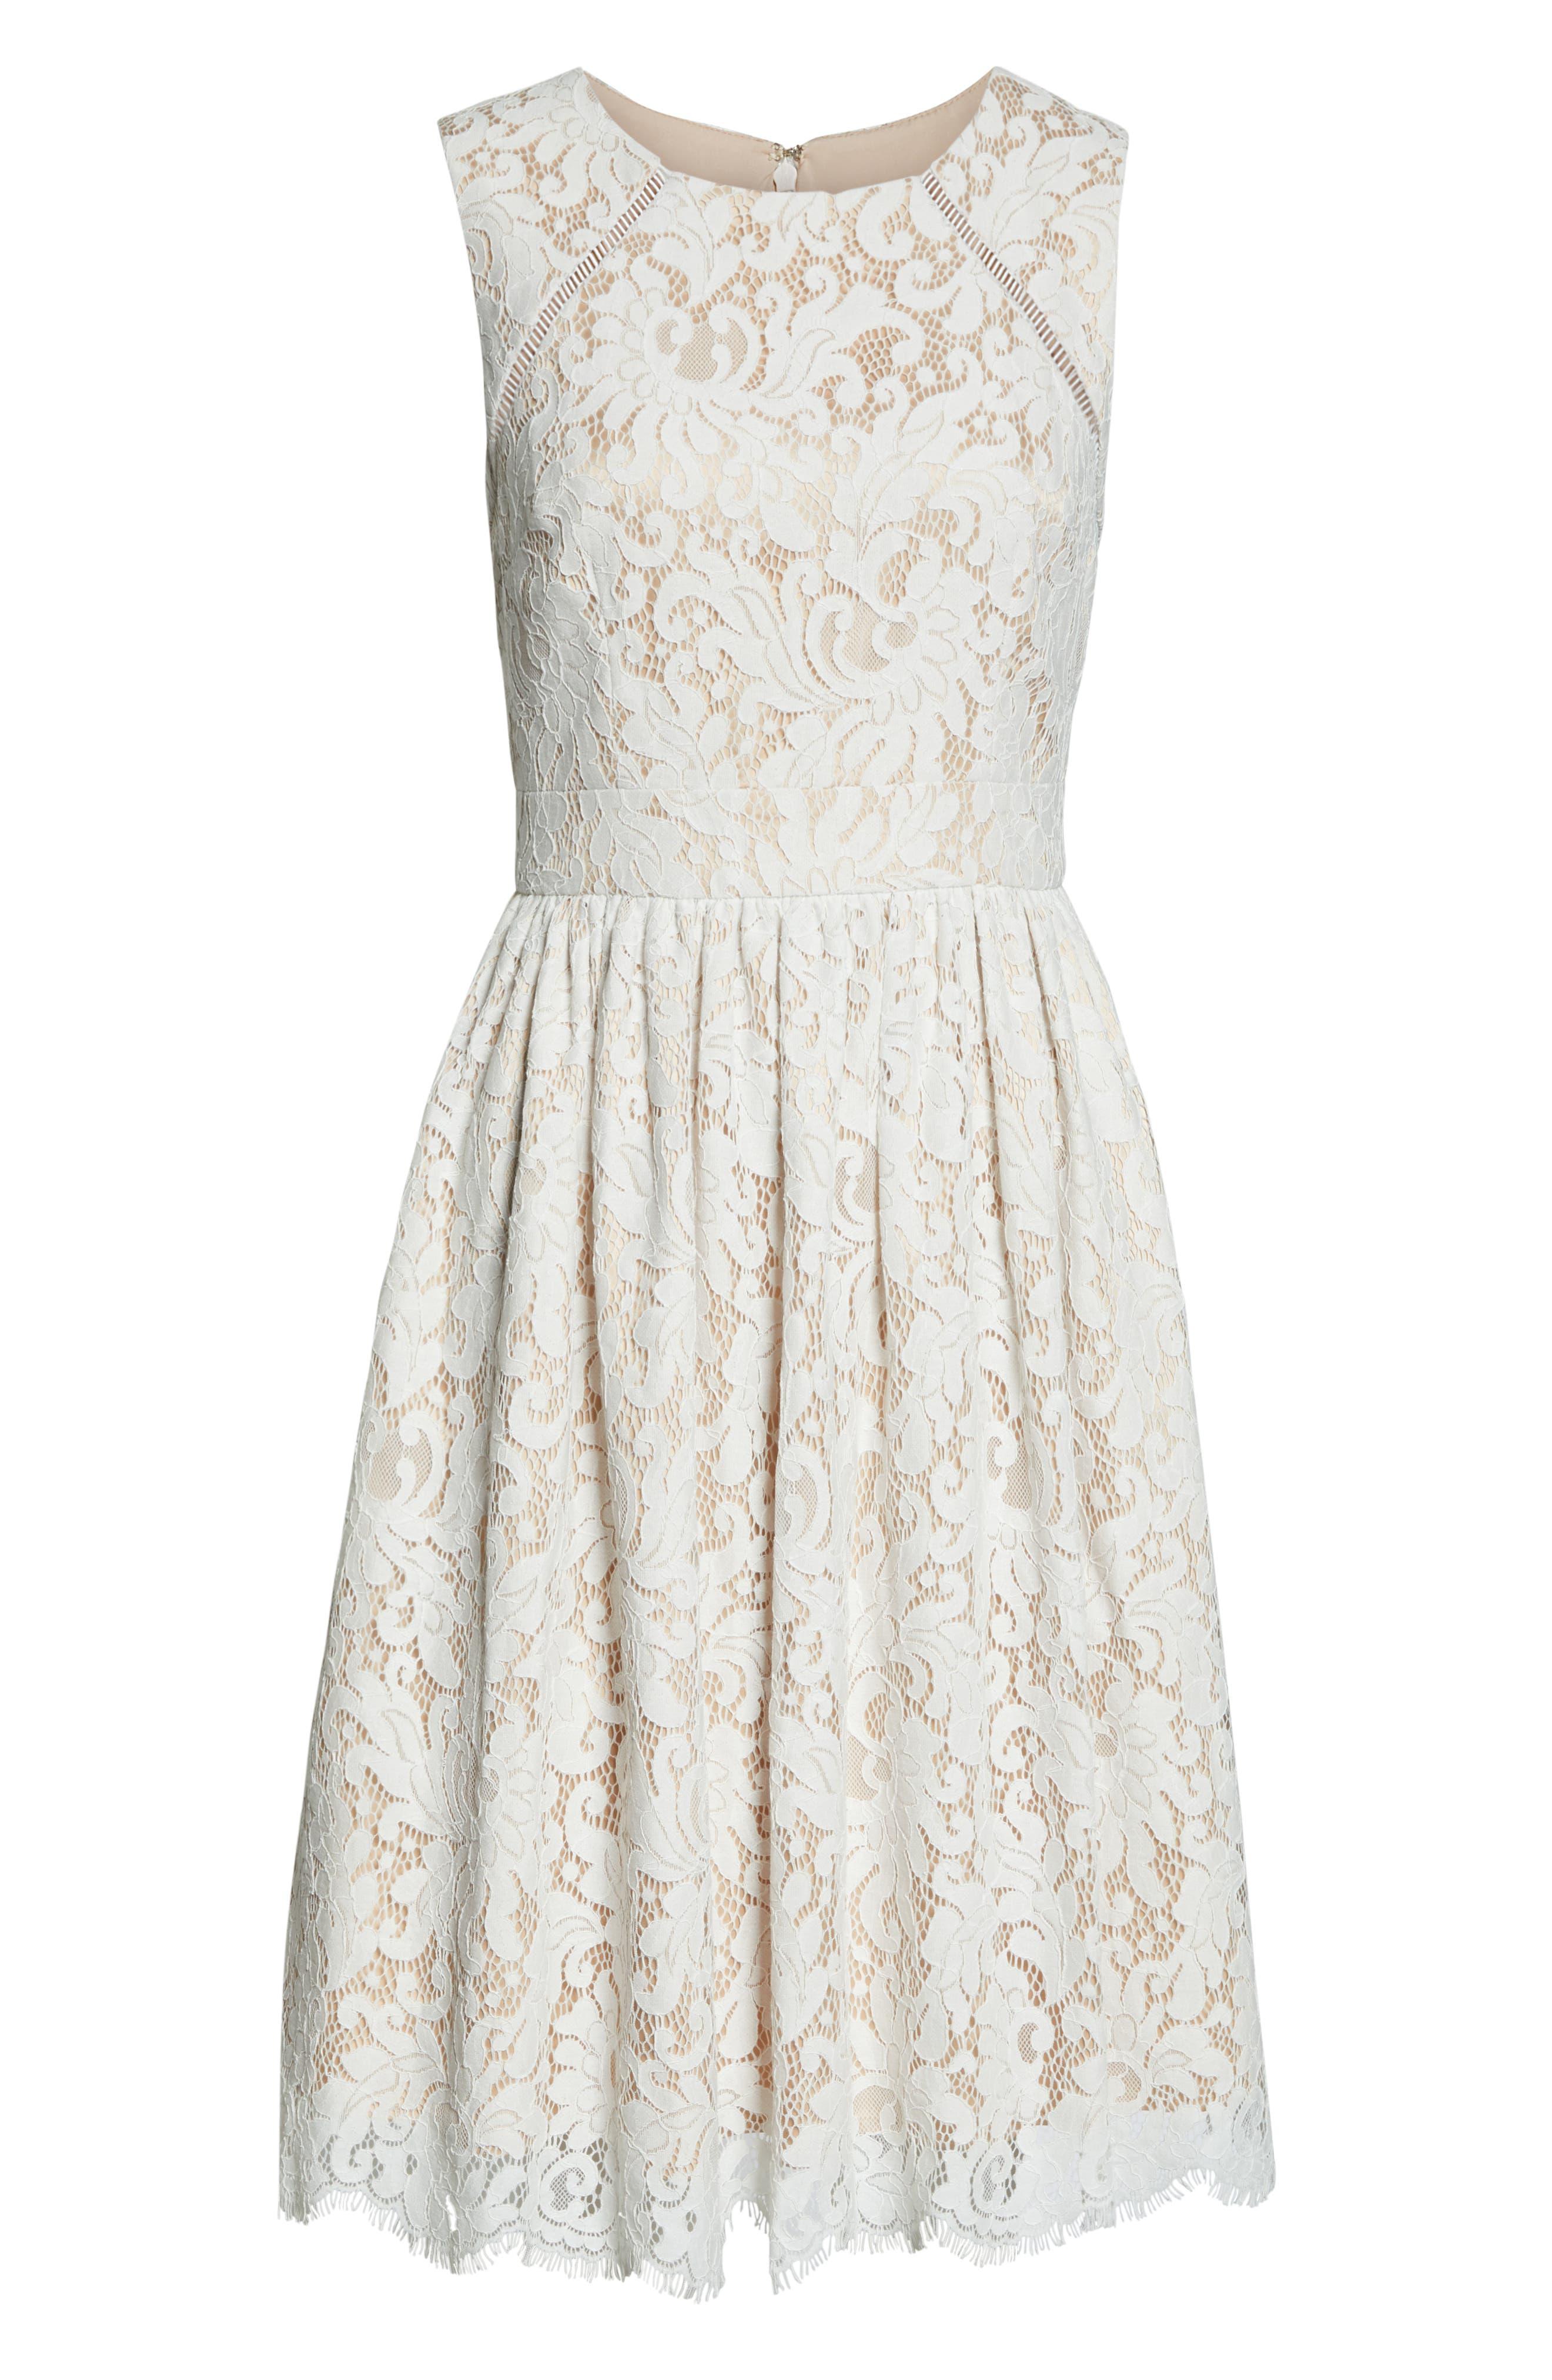 ELIZA J, Lace Fit & Flare Dress, Alternate thumbnail 7, color, IVORY